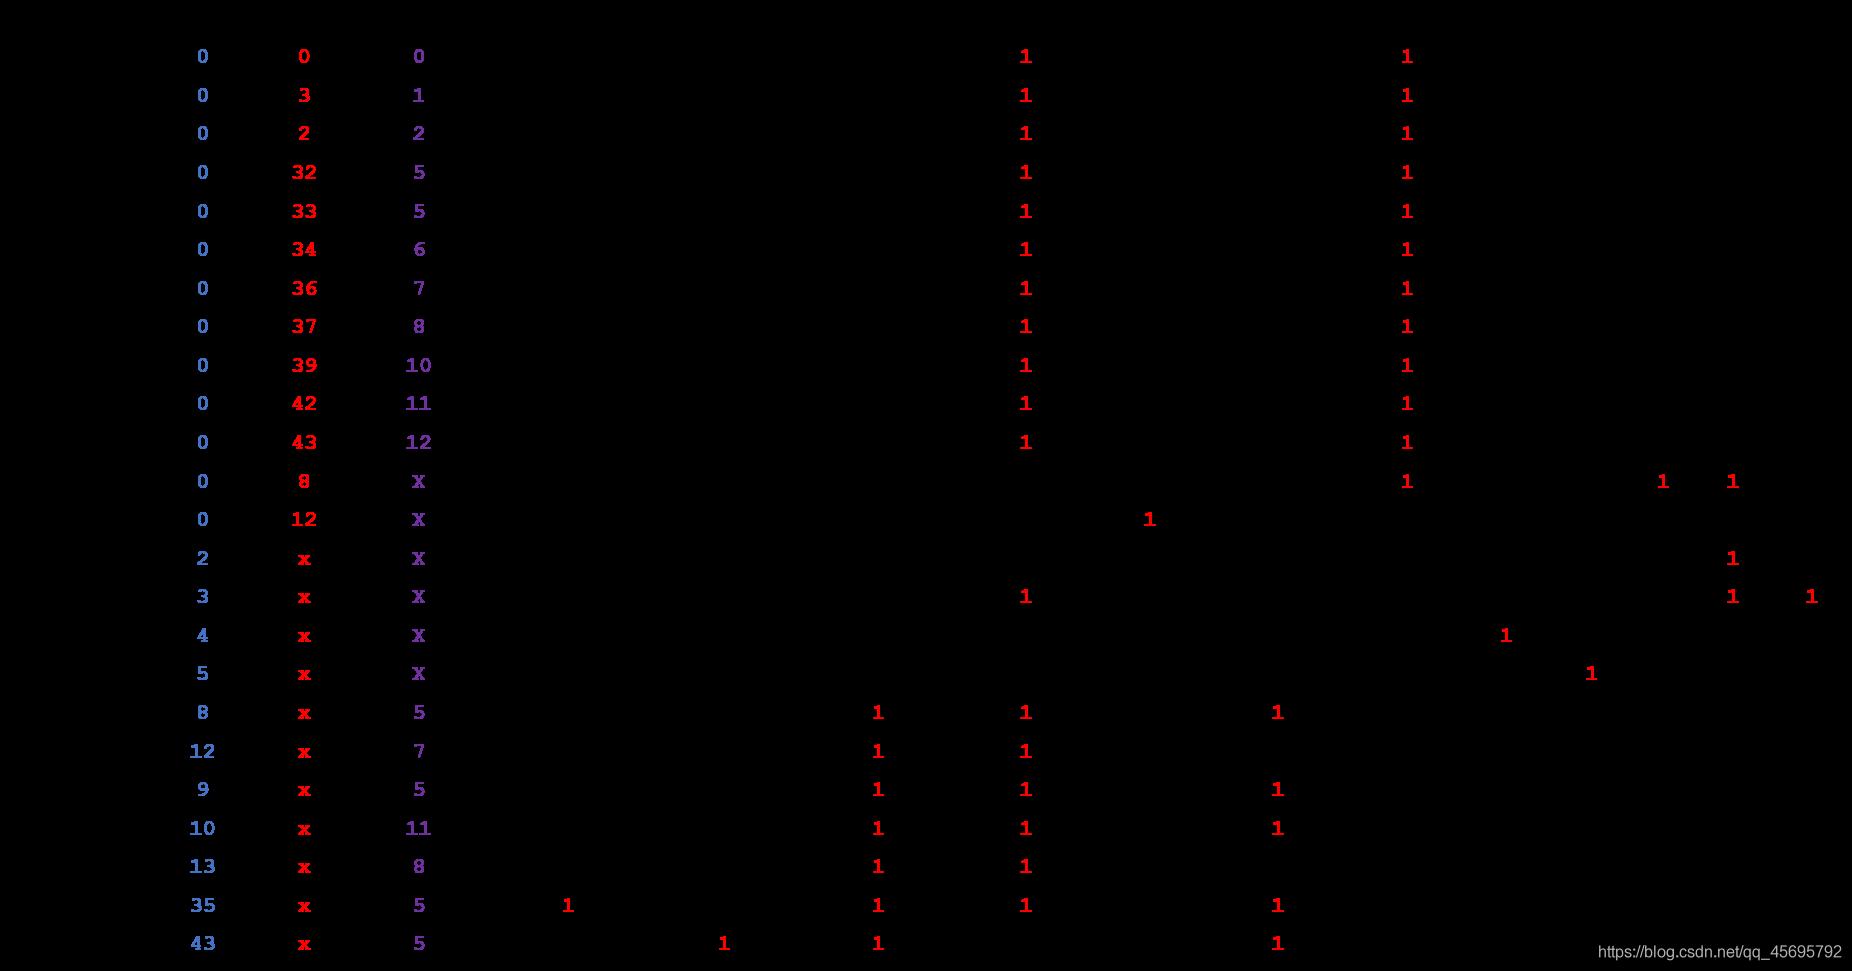 ALU_OP及控制信号